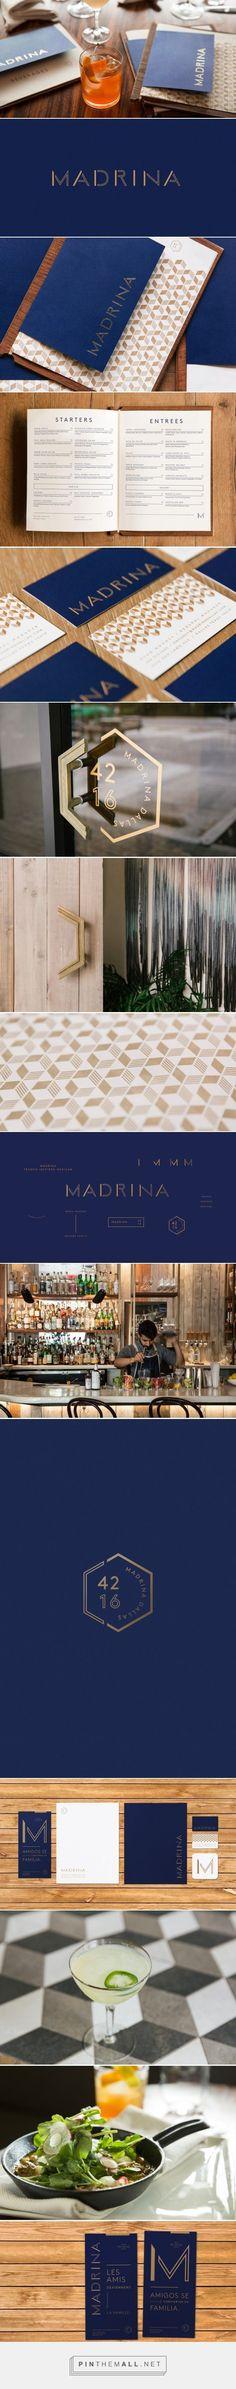 Madrina Restaurant Branding by Mast | Fivestar Branding – Design and Branding Agency & Inspiration Gallery